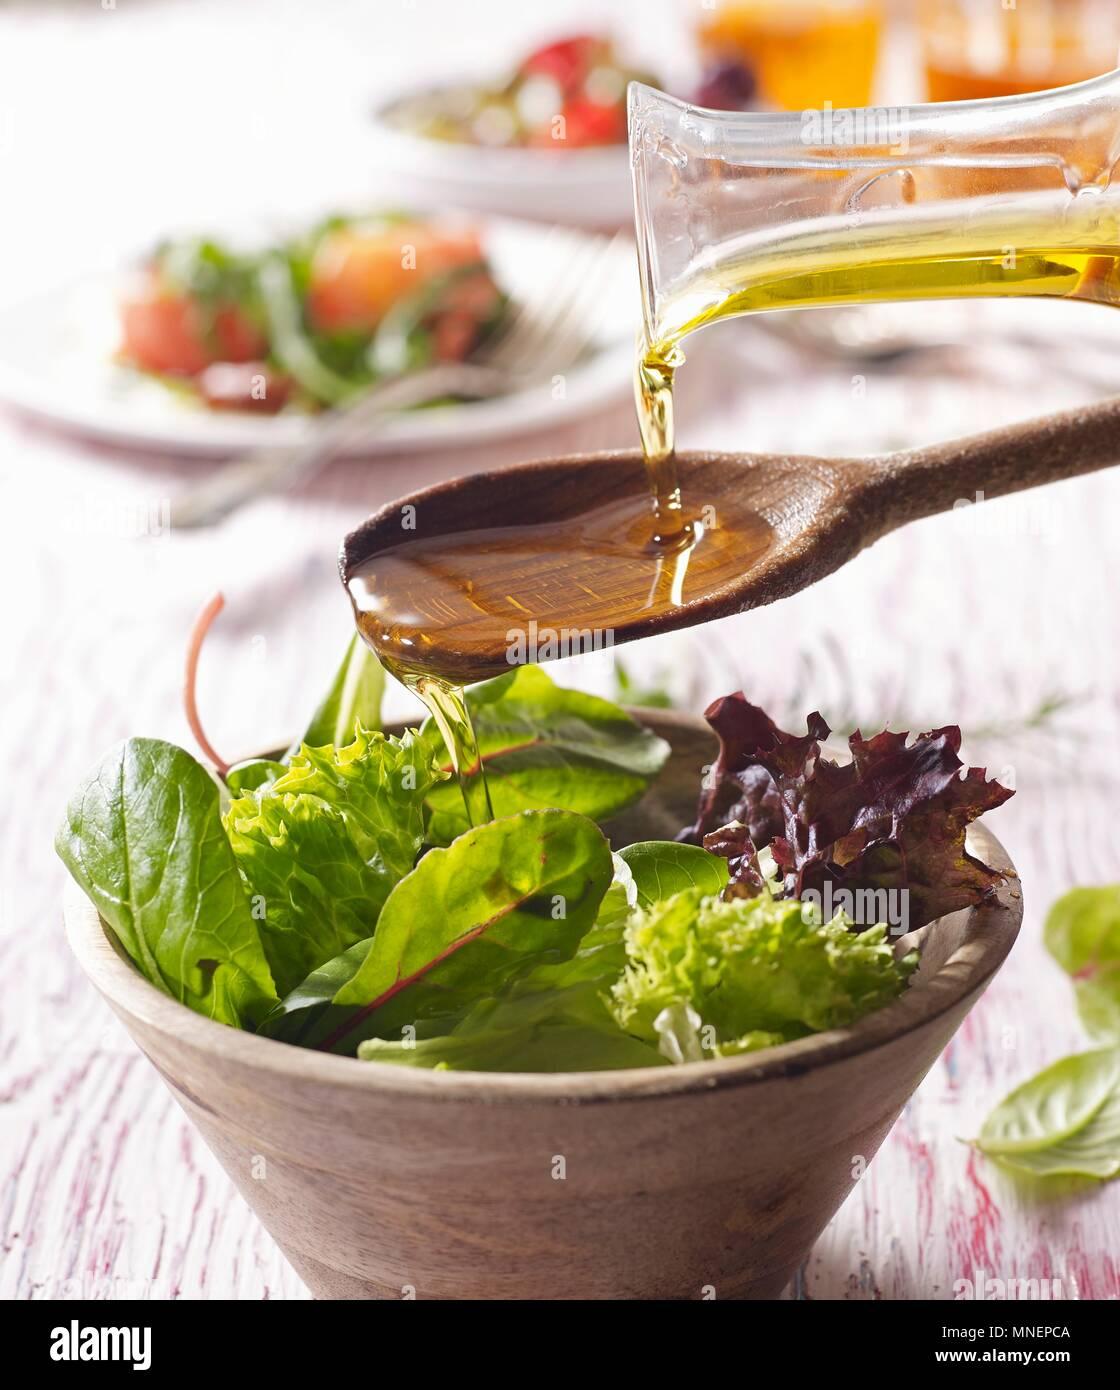 Öl wird über den Salat aus einem Holzlöffel offenporige Stockbild